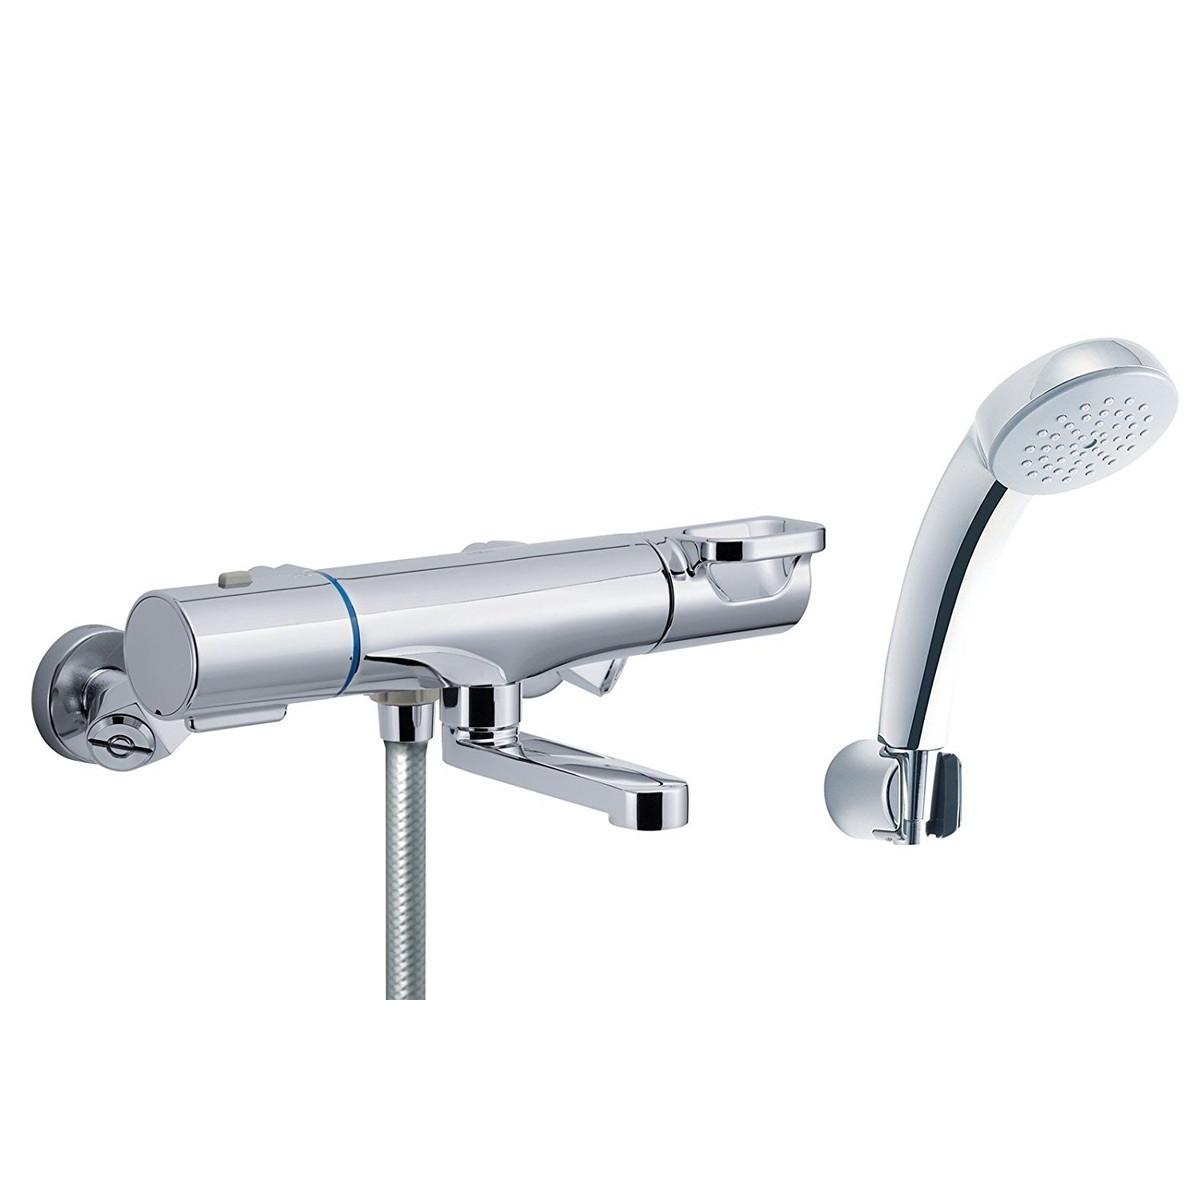 LIXIL(リクシル) INAX 浴室用 サーモスタット付シャワーバス水栓 エコフルシャワー 洗い場専用 凍結防止水抜き仕様 RBF-813N